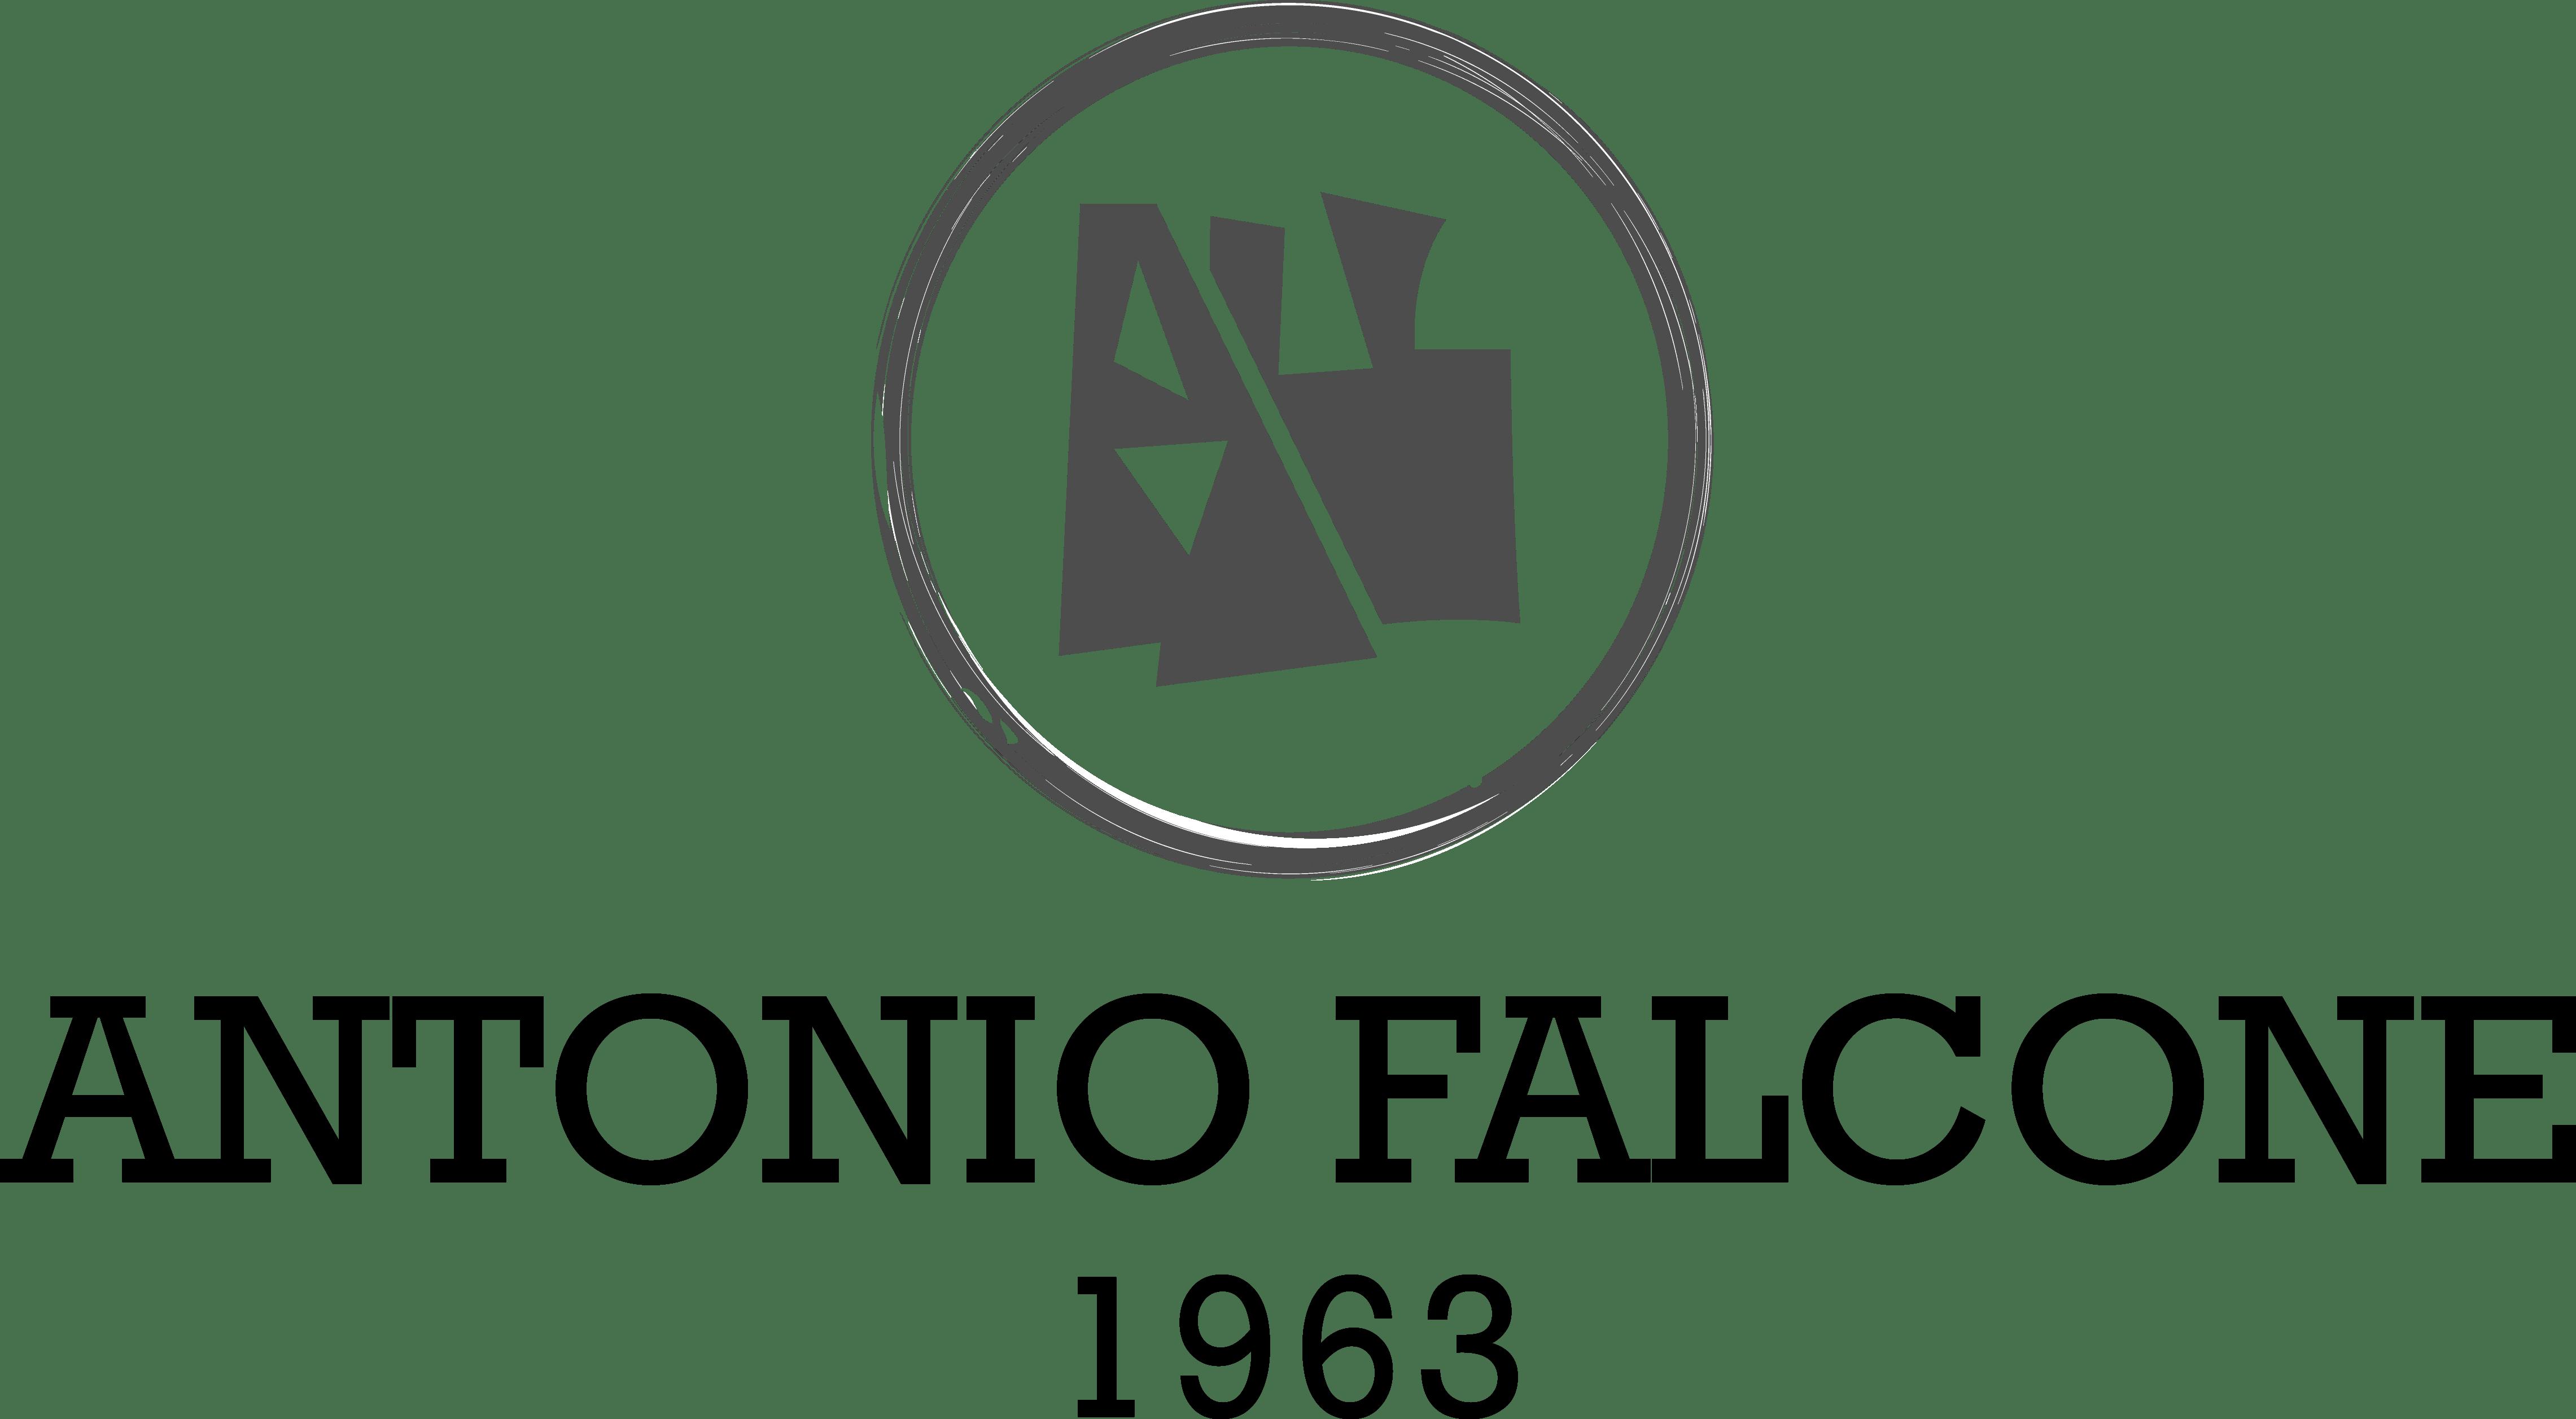 Antonio Falcone | Official Online Store